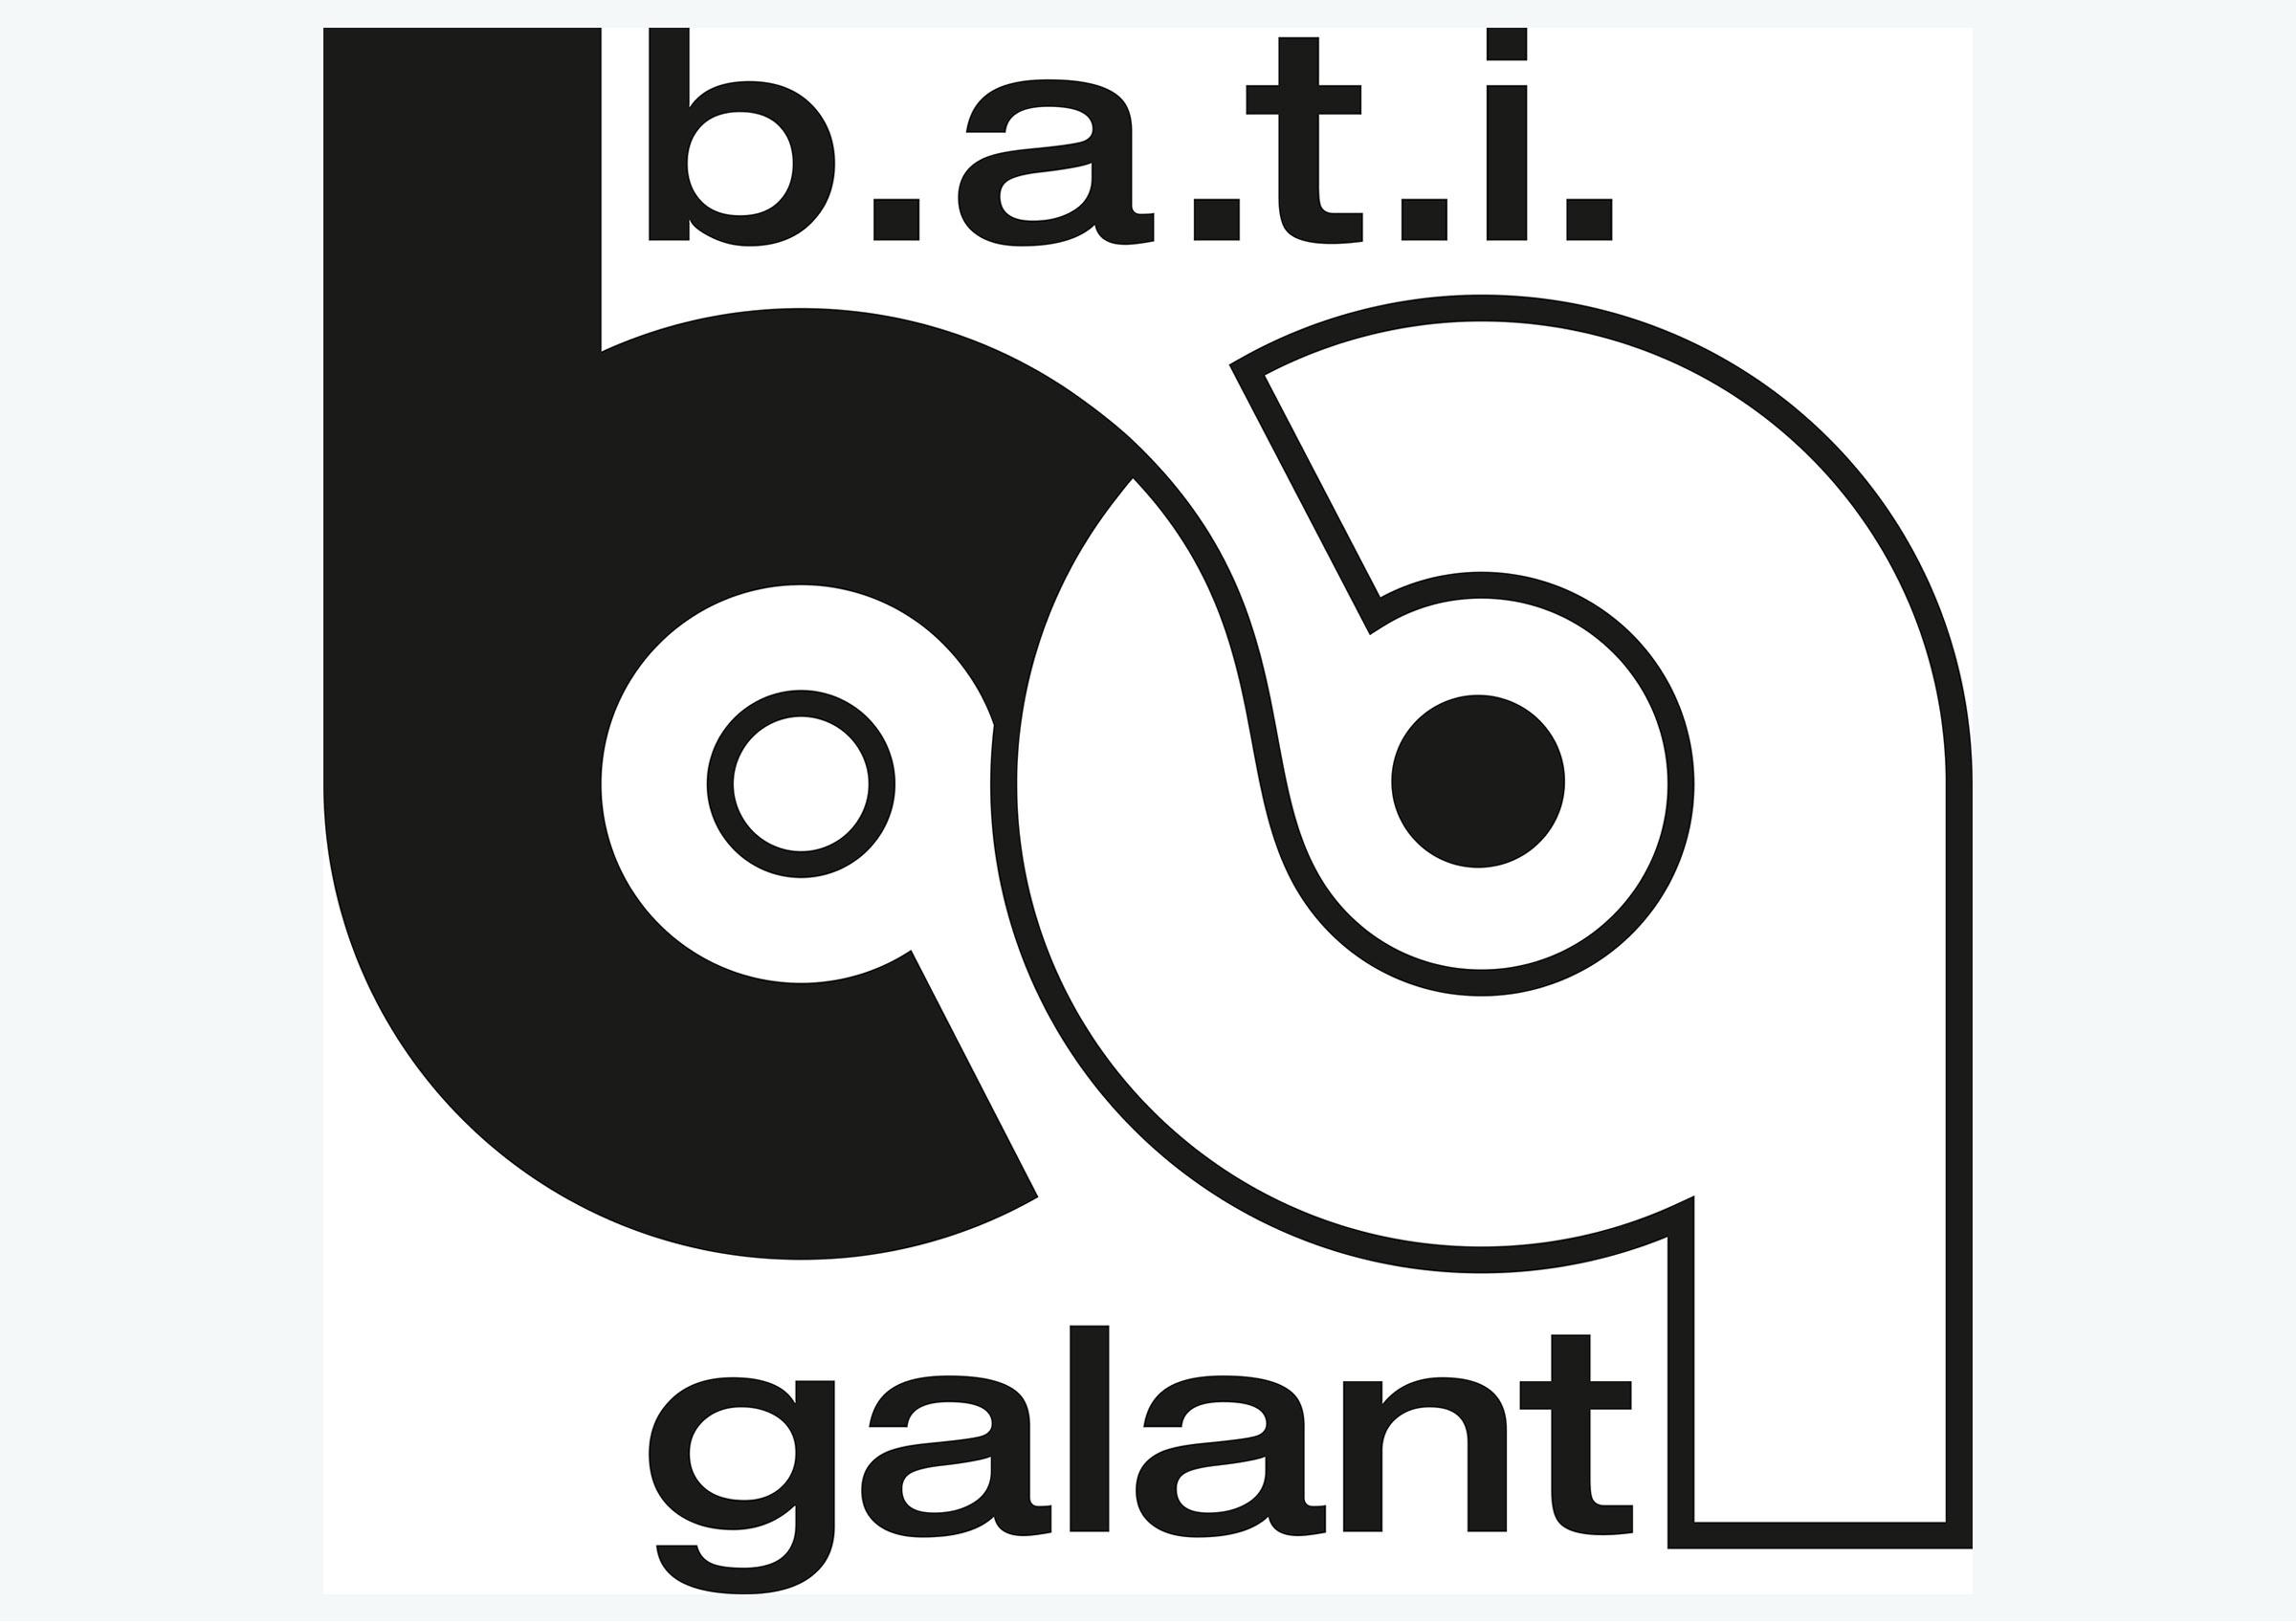 bati_galant m